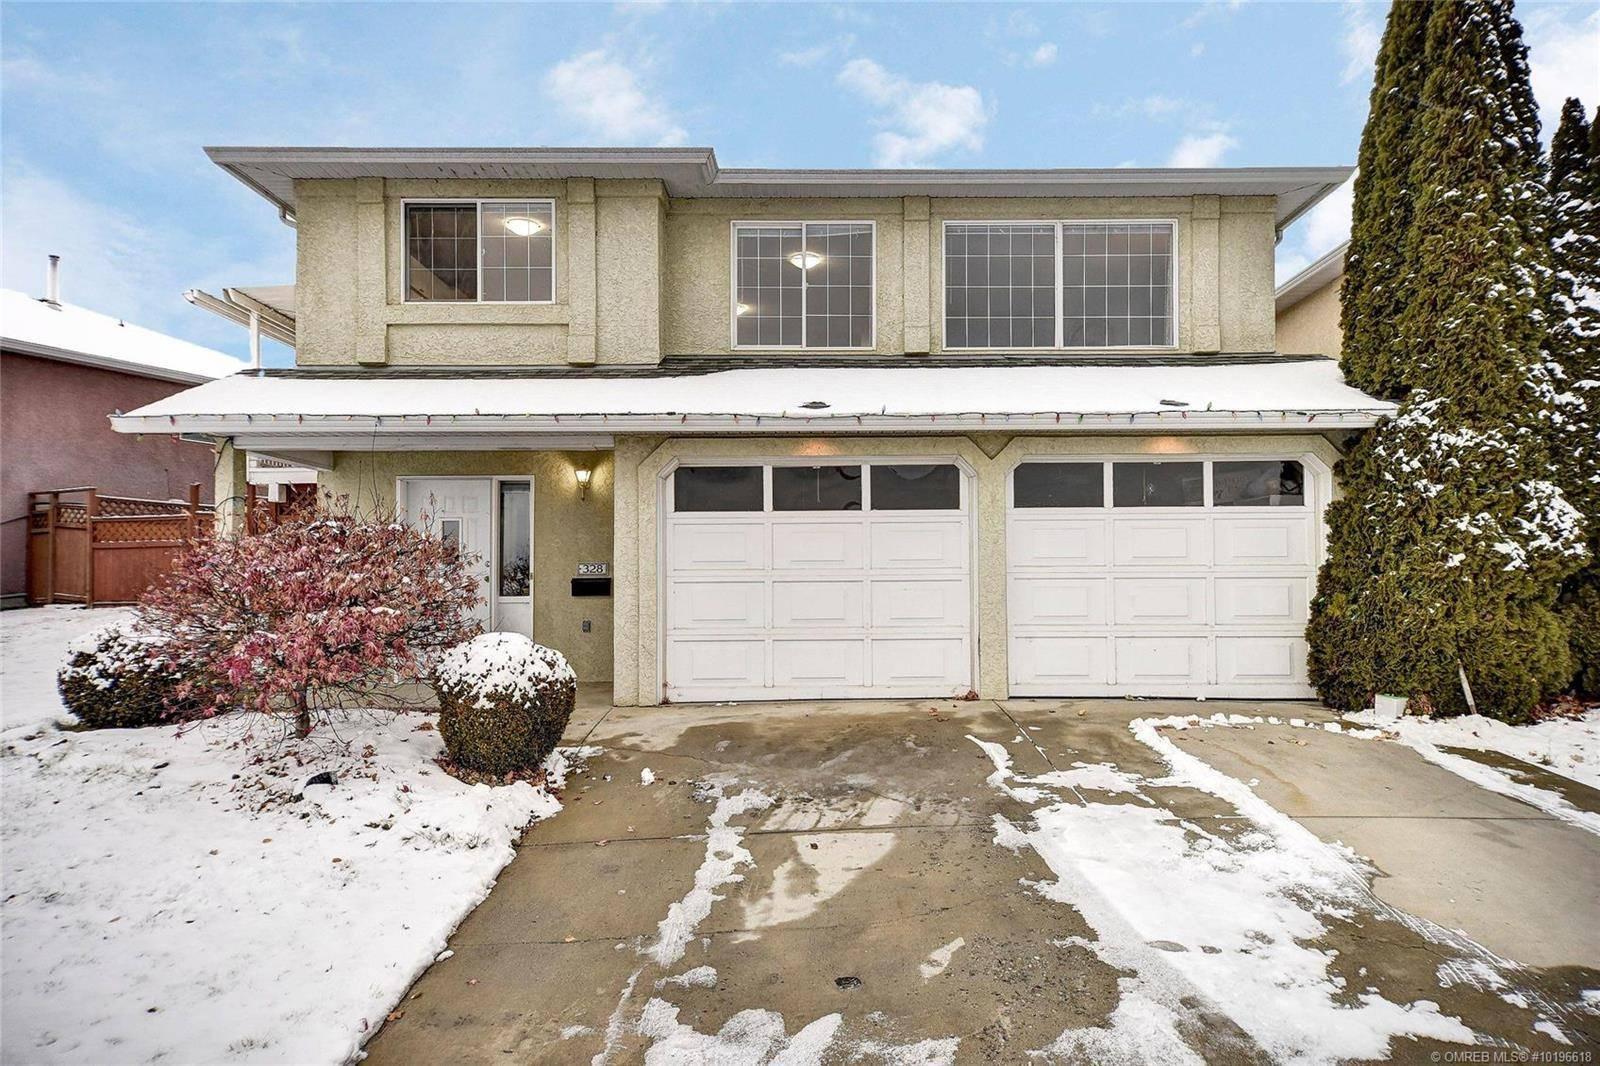 House for sale at 2440 Old Okanagan Hy Unit 328 West Kelowna British Columbia - MLS: 10196618